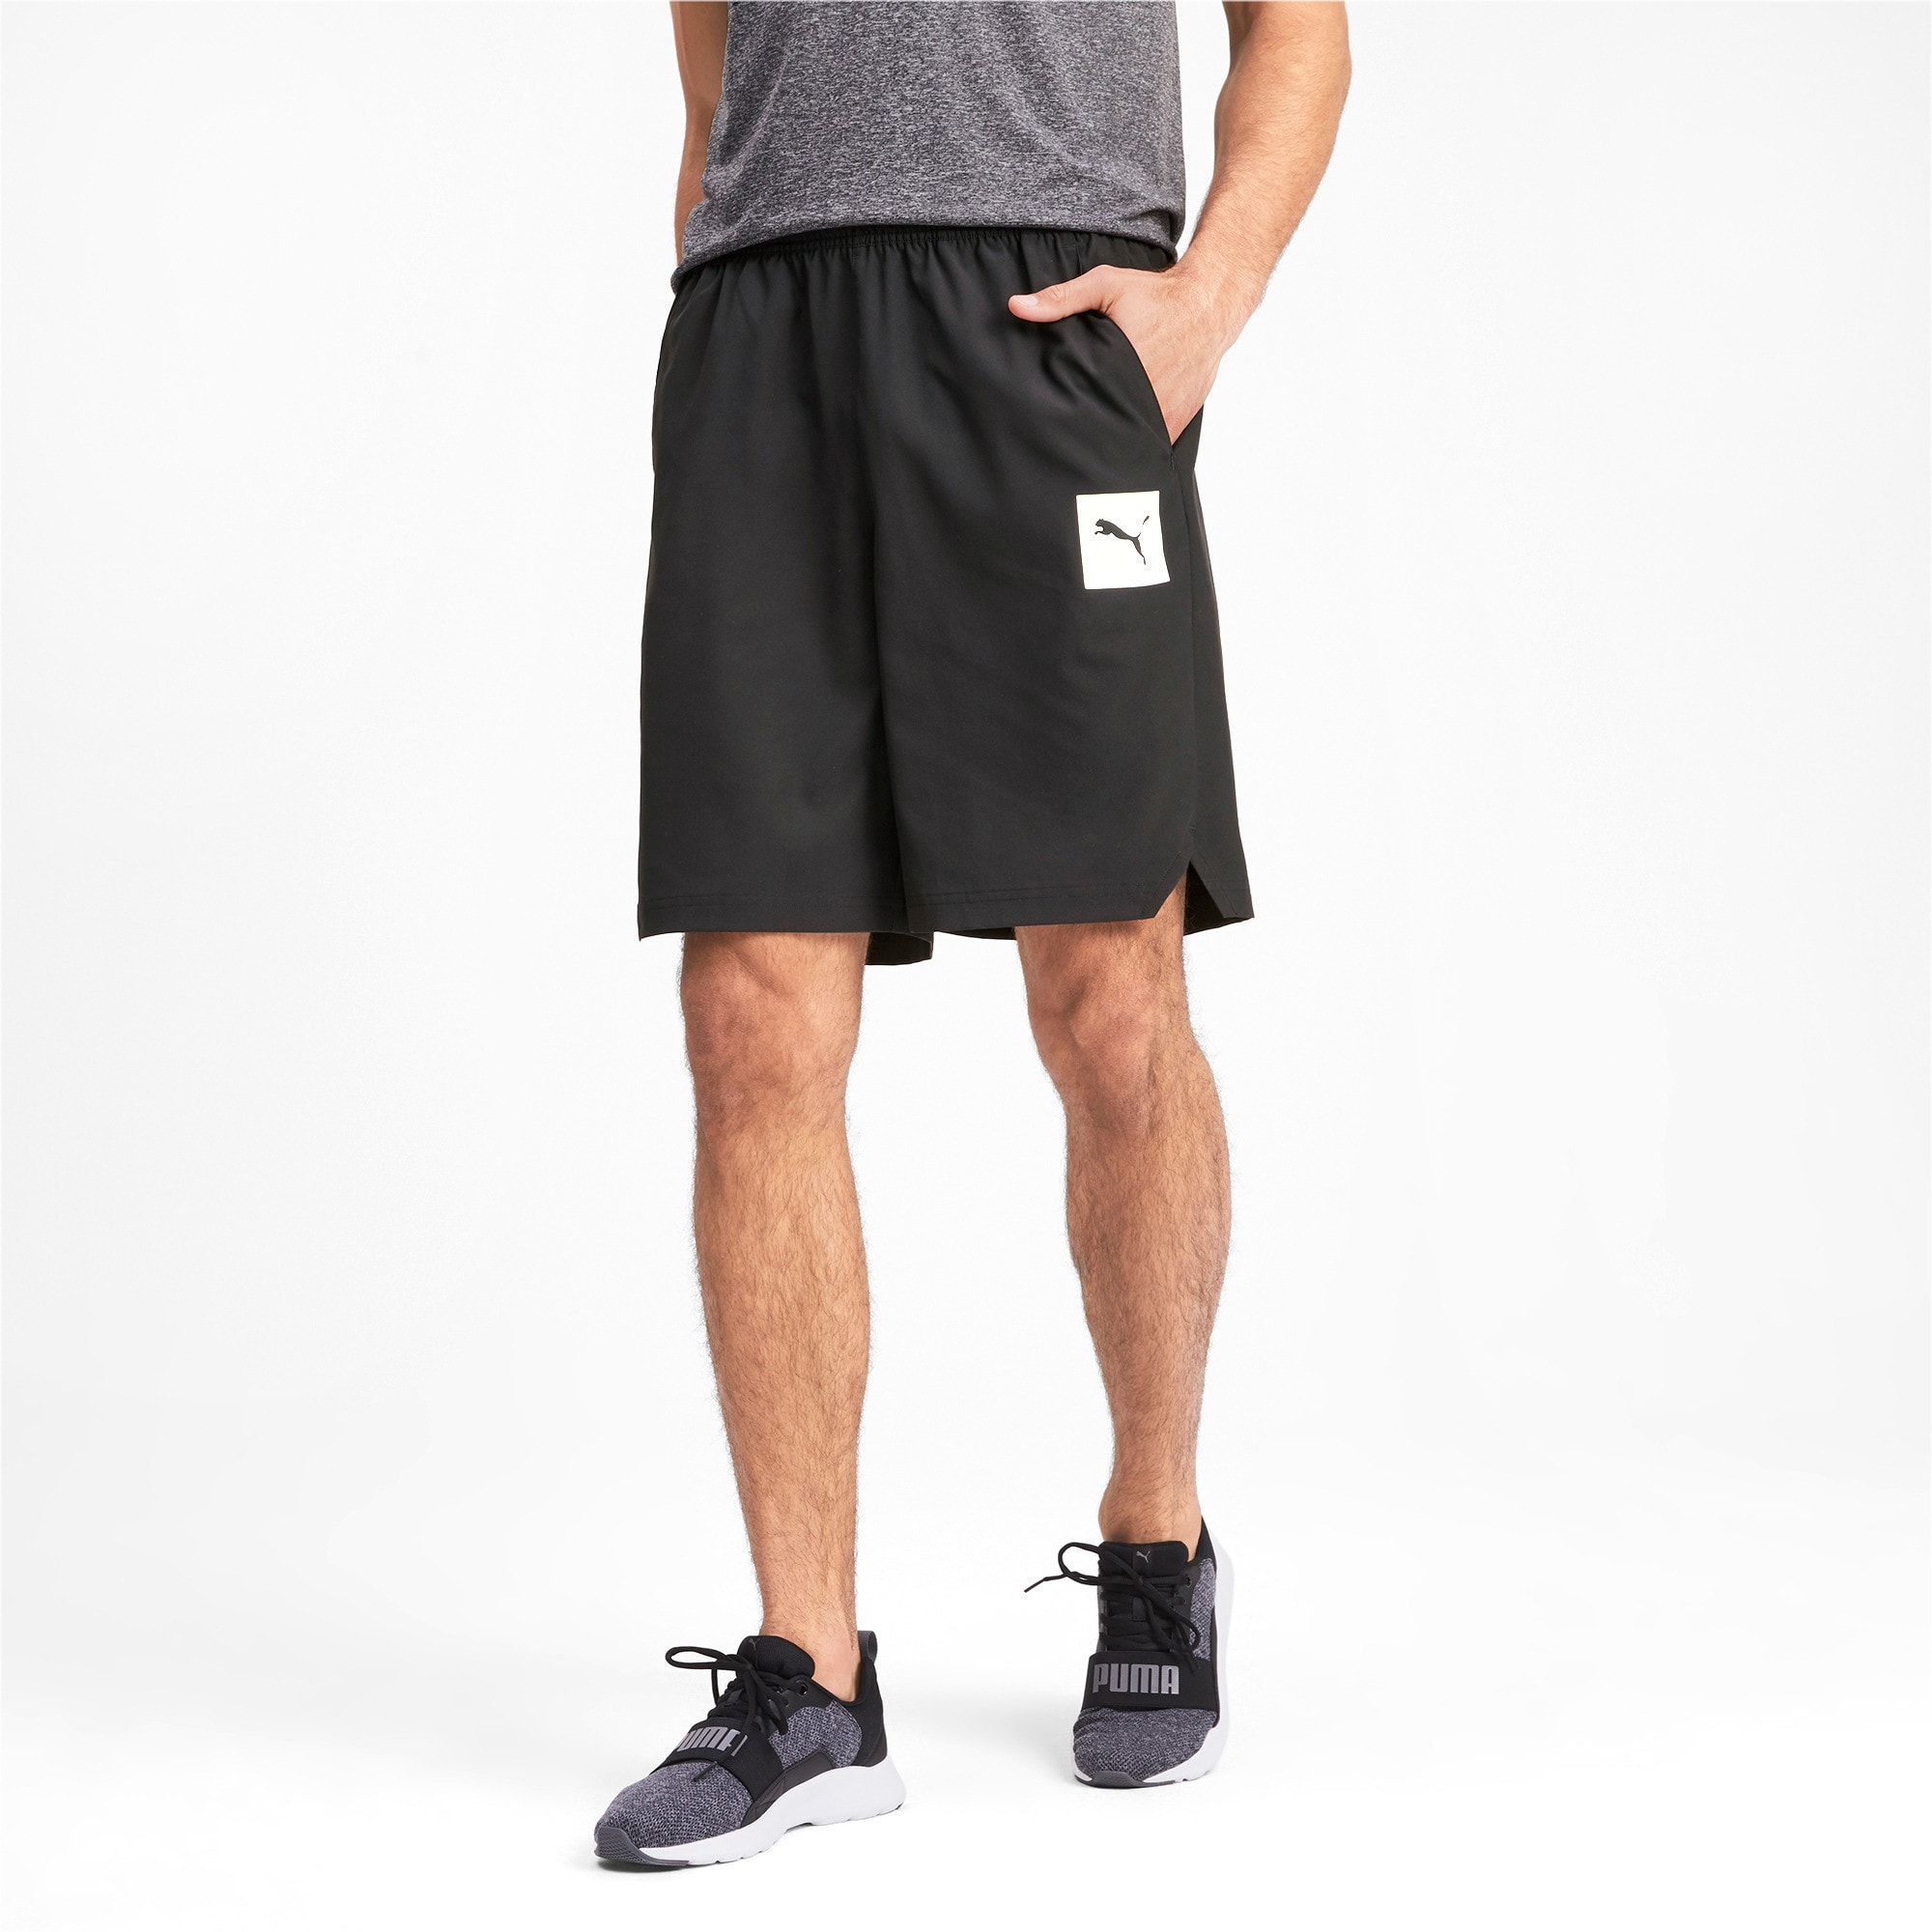 Thumbnail 1 of Tec Sports Men's Woven Shorts, Puma Black, medium-IND